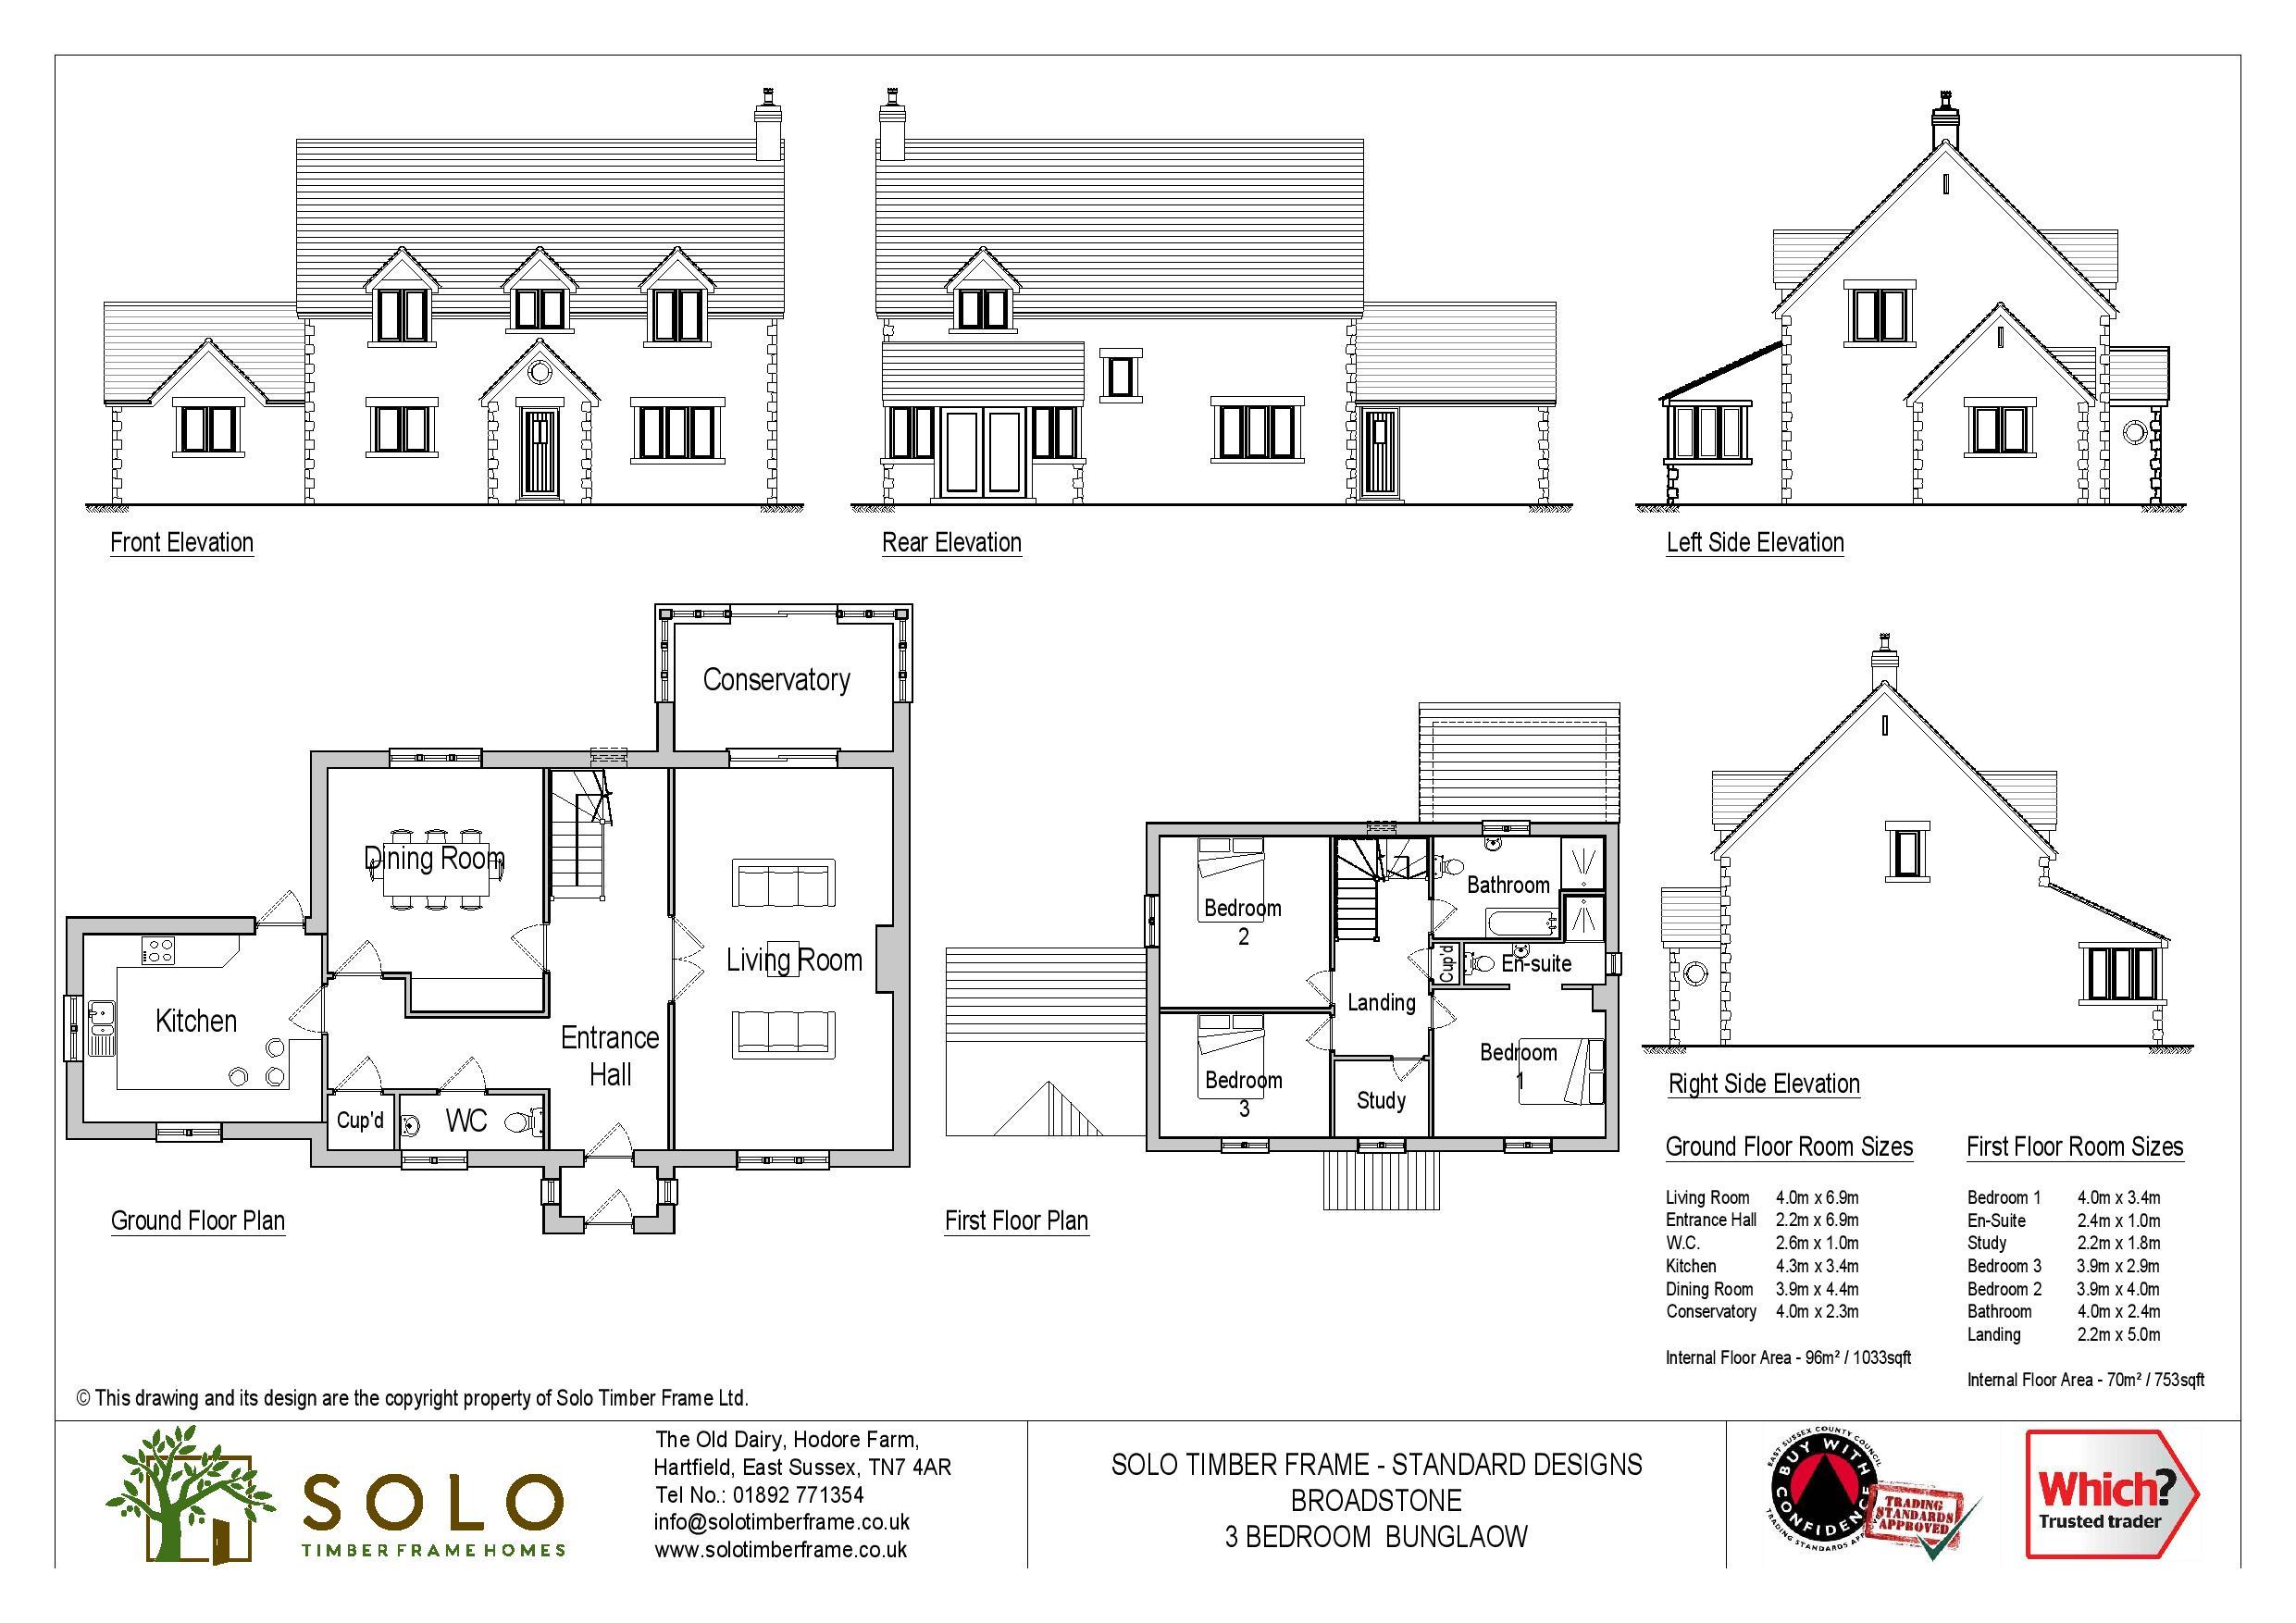 Broadstone 3 or 4 Bedroom House Design